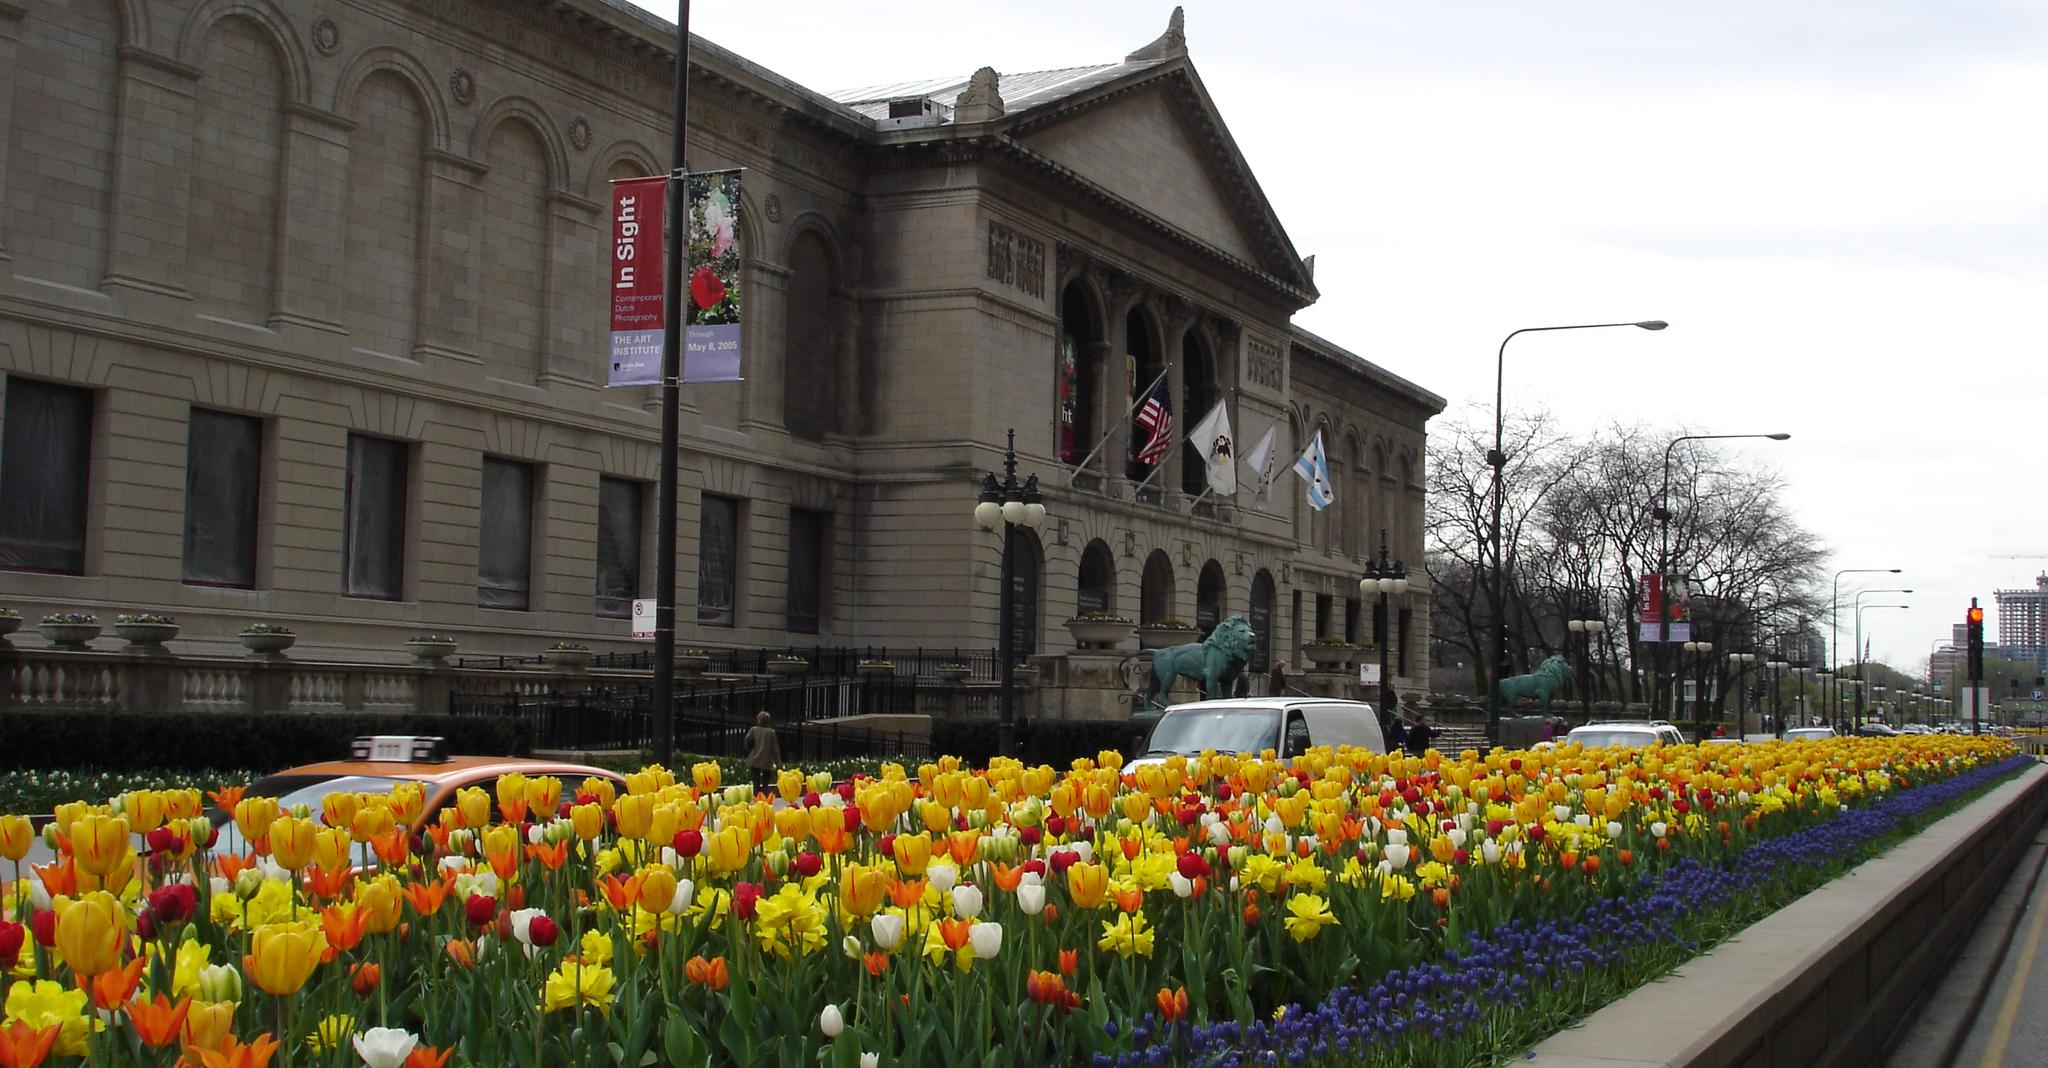 Michigan Avenue Medians at The Art Institute